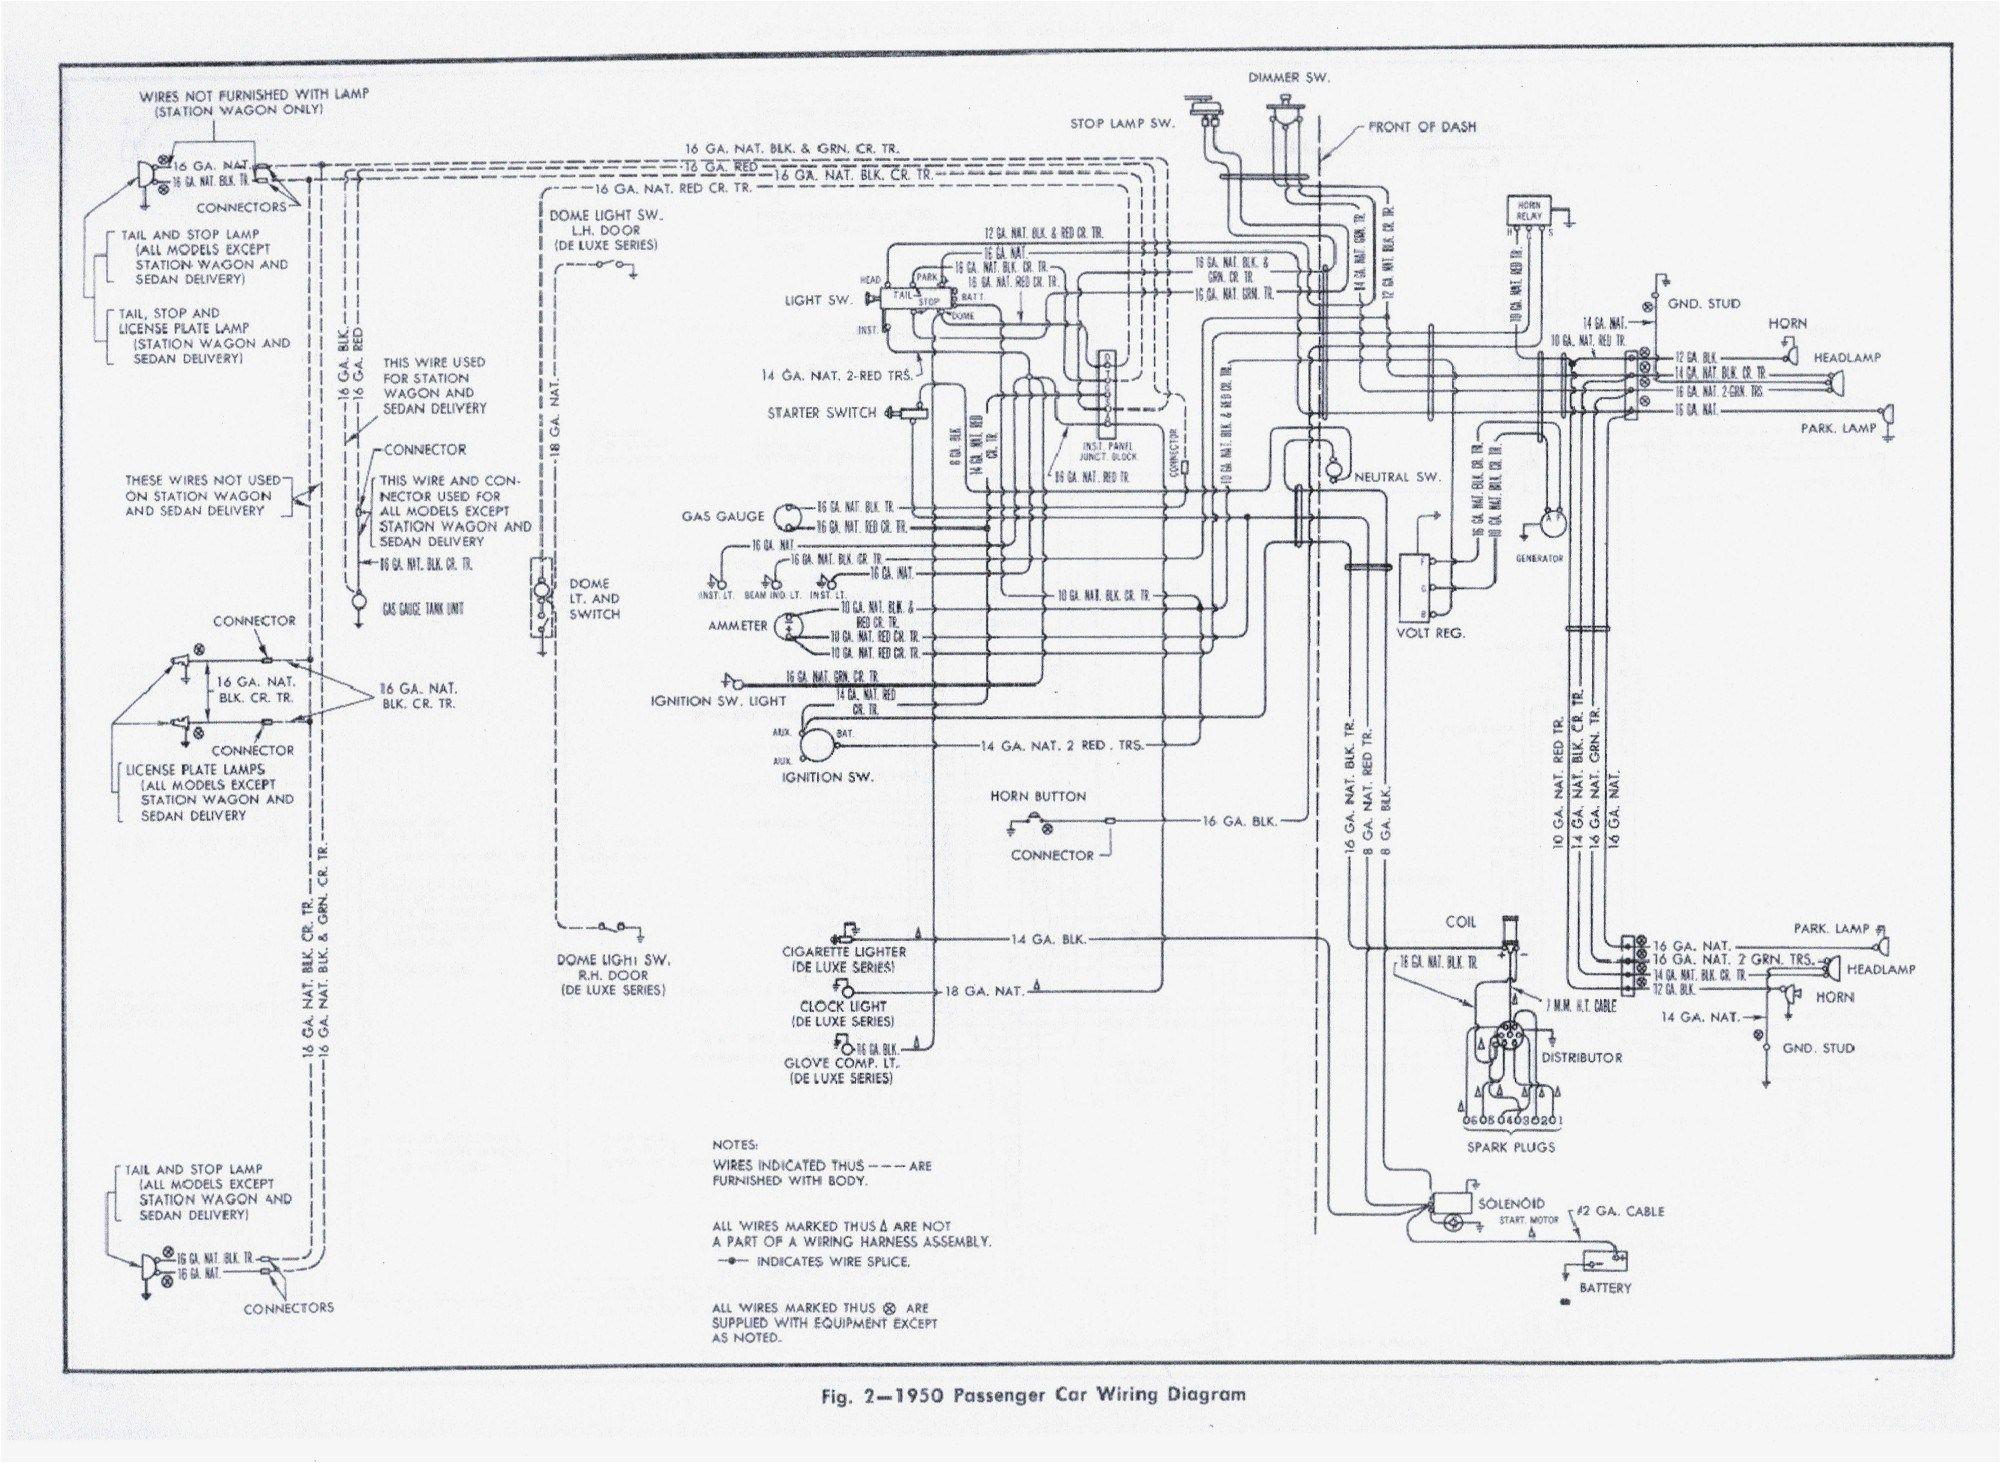 Diagram 02 Deville Air Ride Wiring Diagram Full Version Hd Quality Wiring Diagram Diagramtonyb Nowroma It